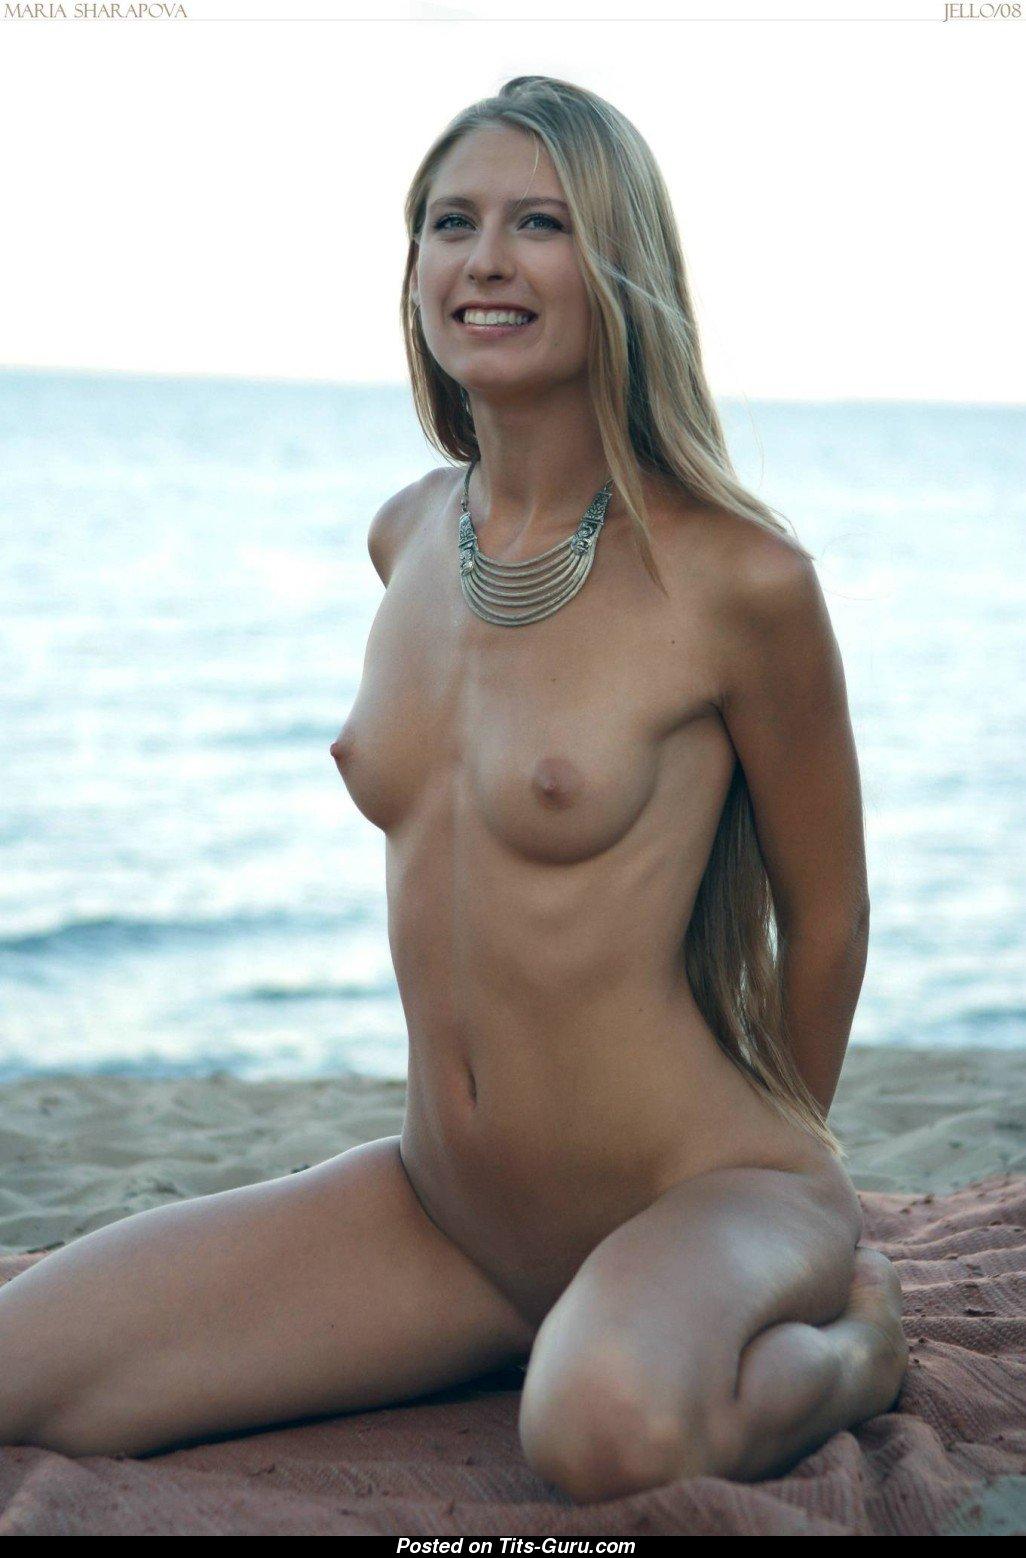 Sharapova Topless photo 24